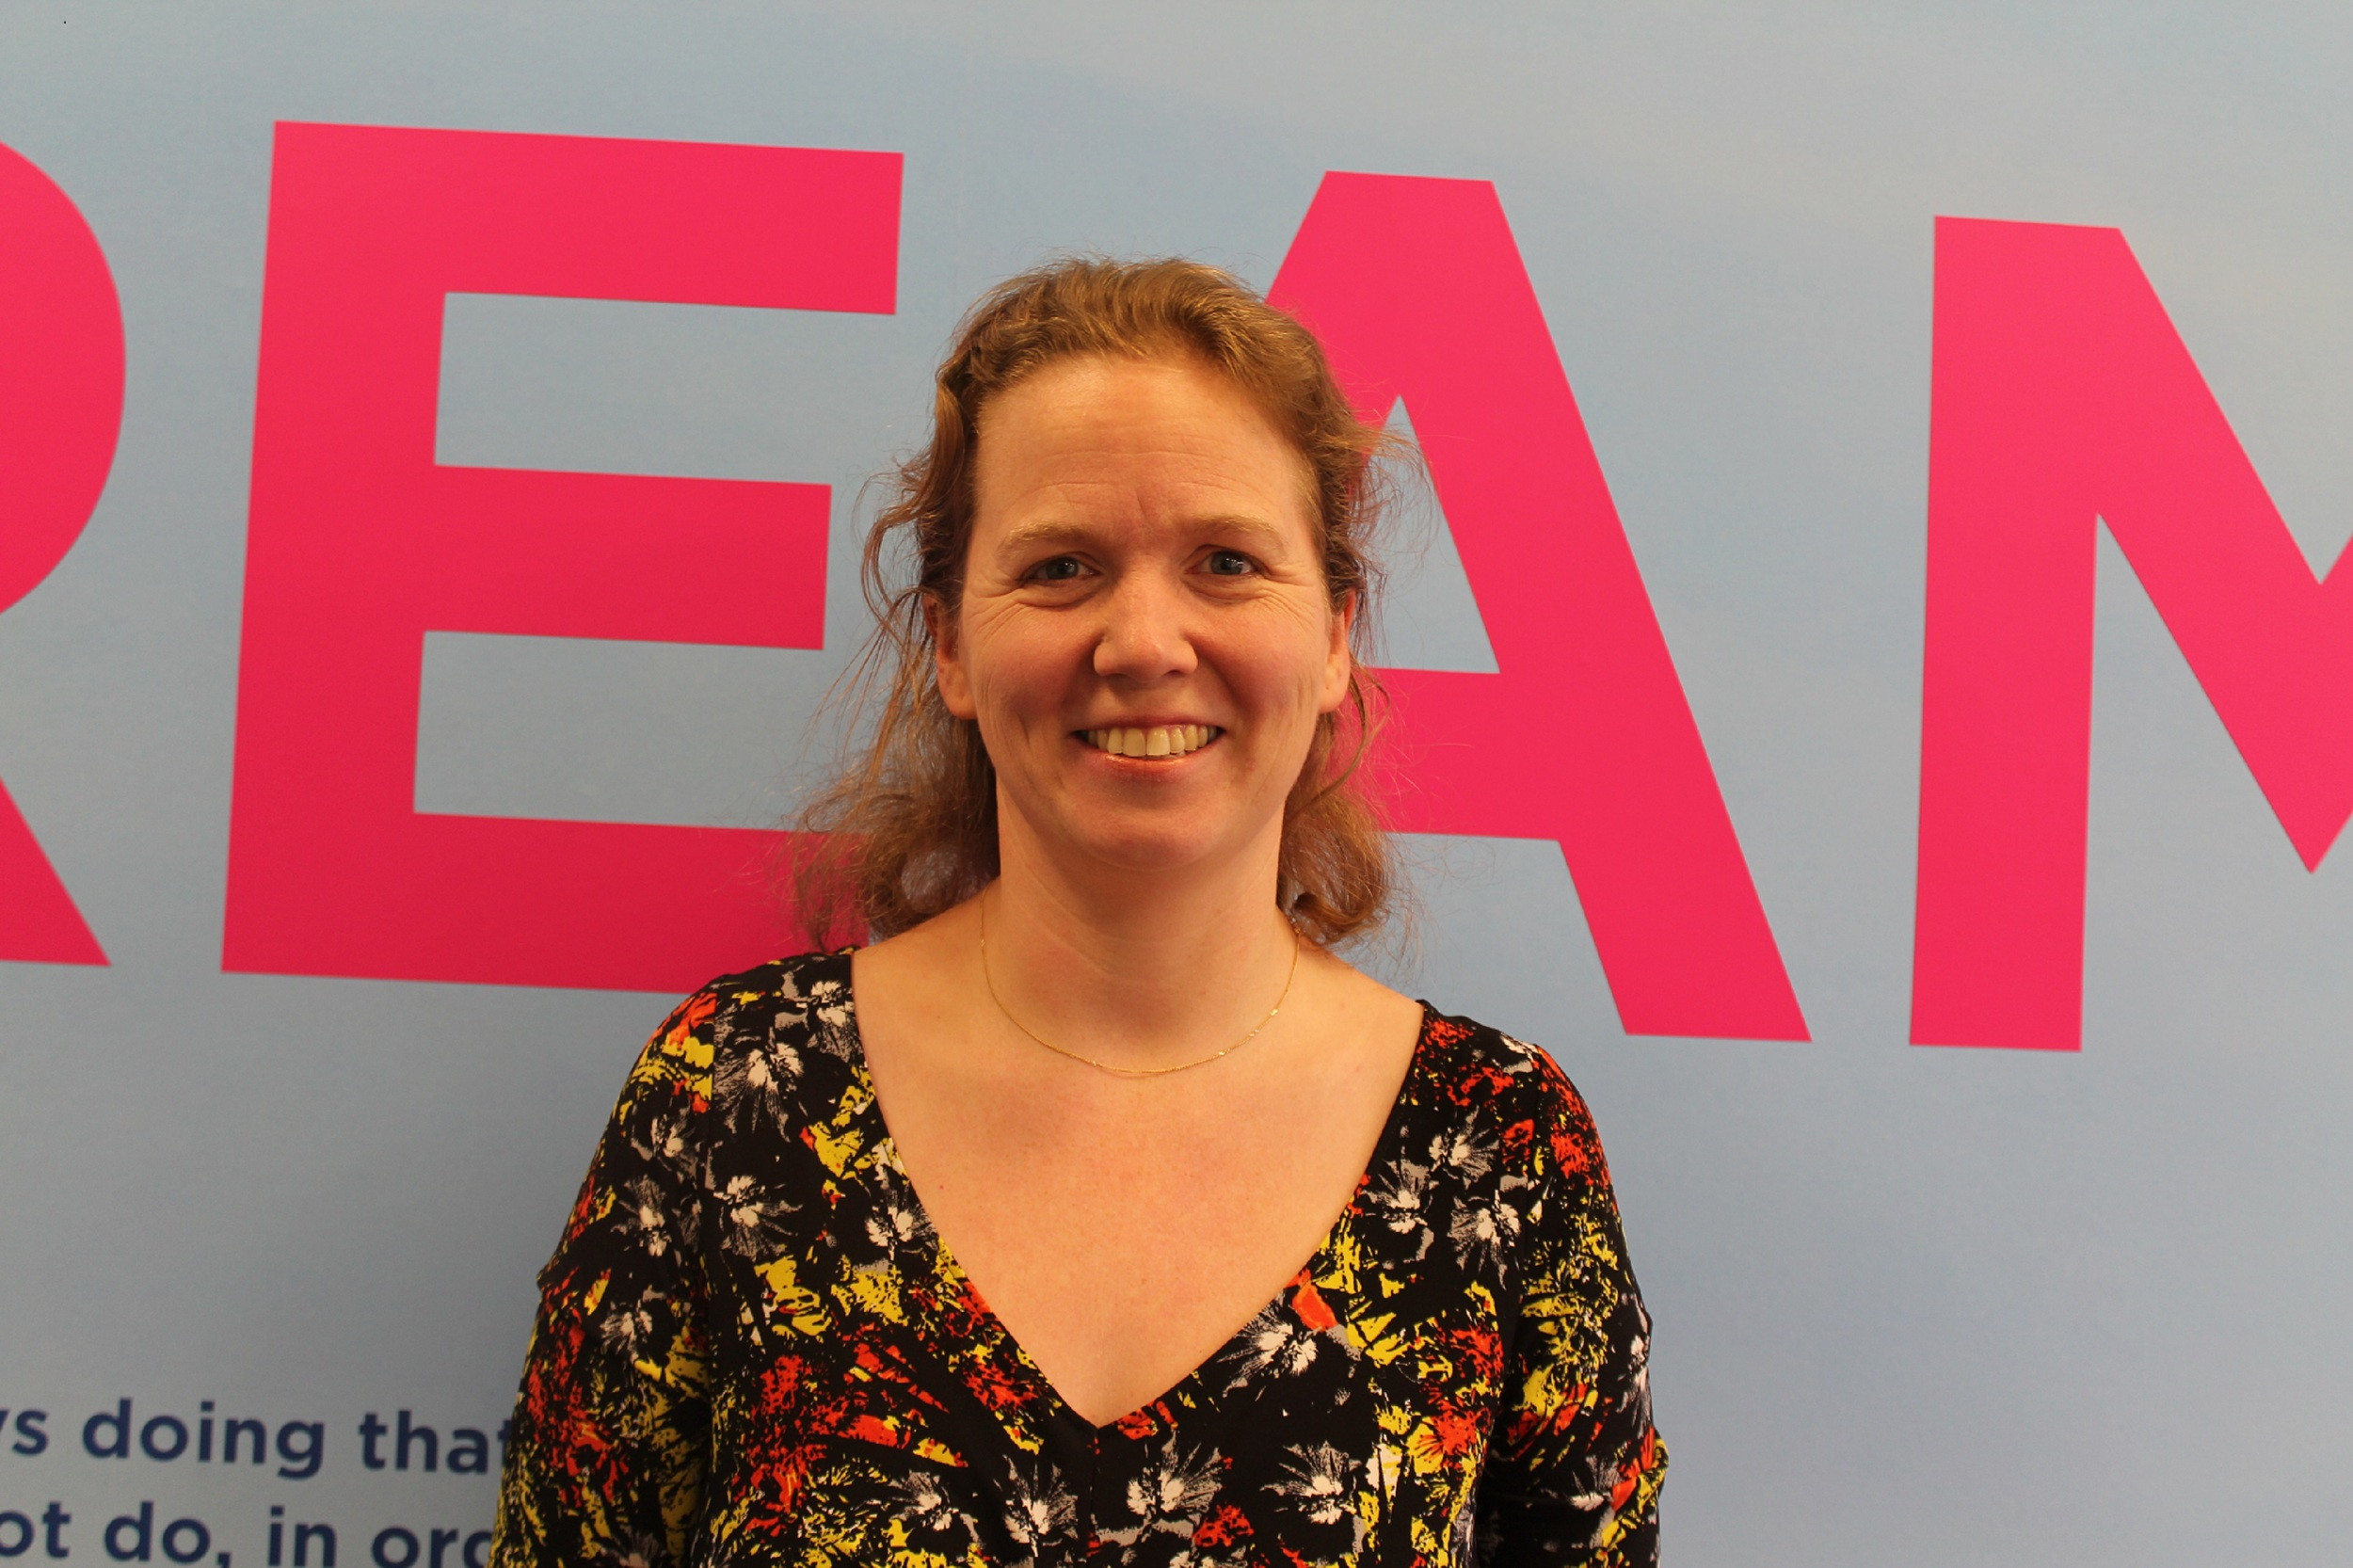 Caroline Rands, Financial Controller at PKF Cooper Parry